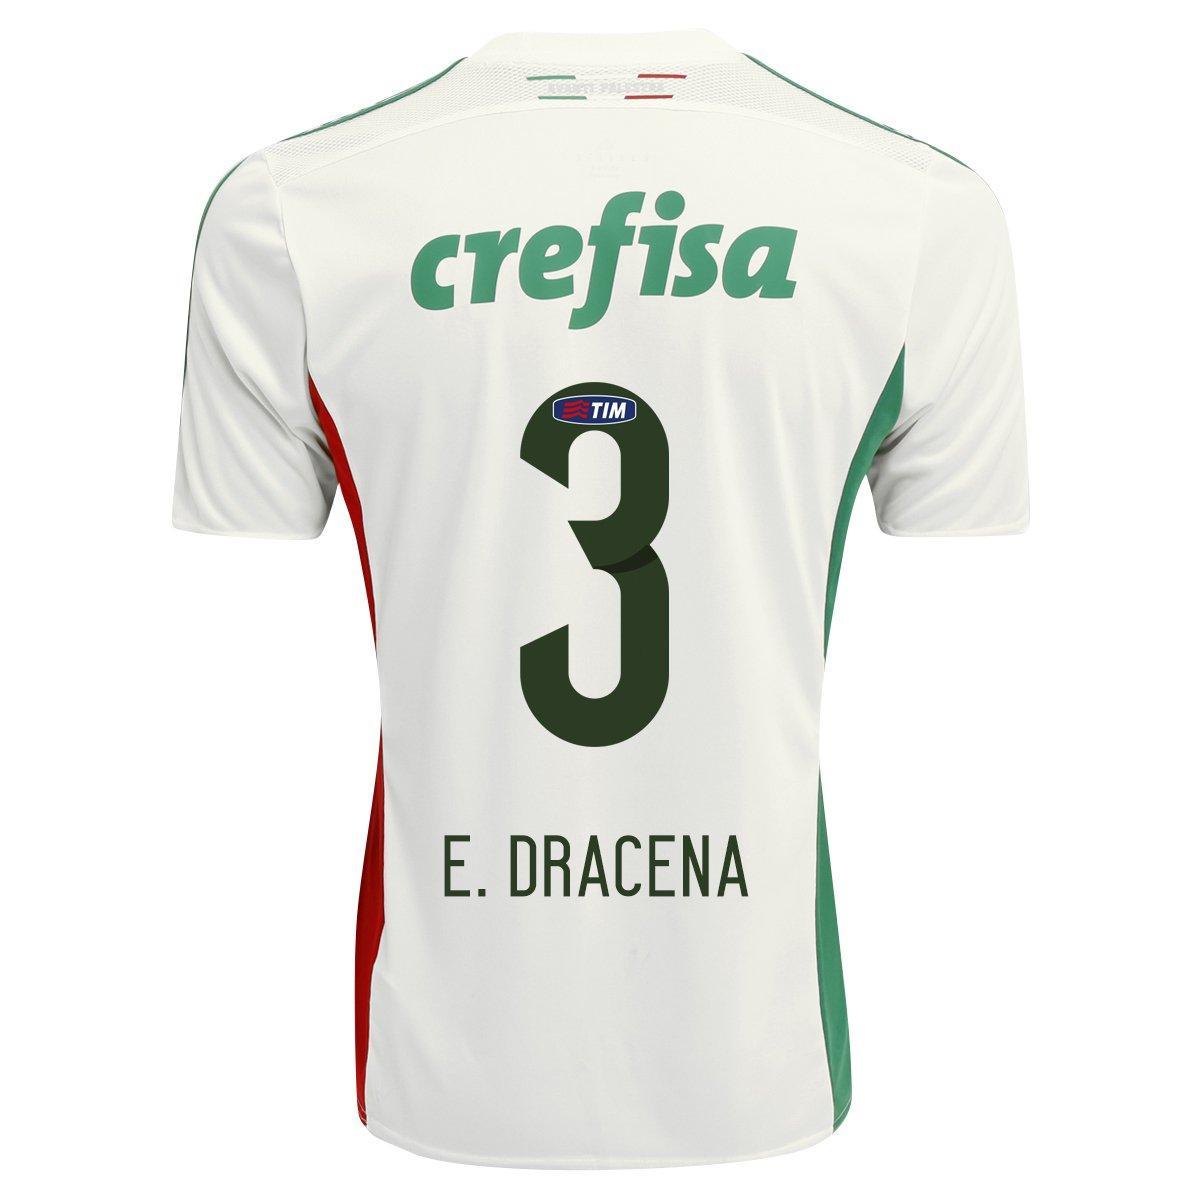 Camisa Adidas Palmeiras II 15 16 nº 3 - E. Dracena 2fba866c72ee5